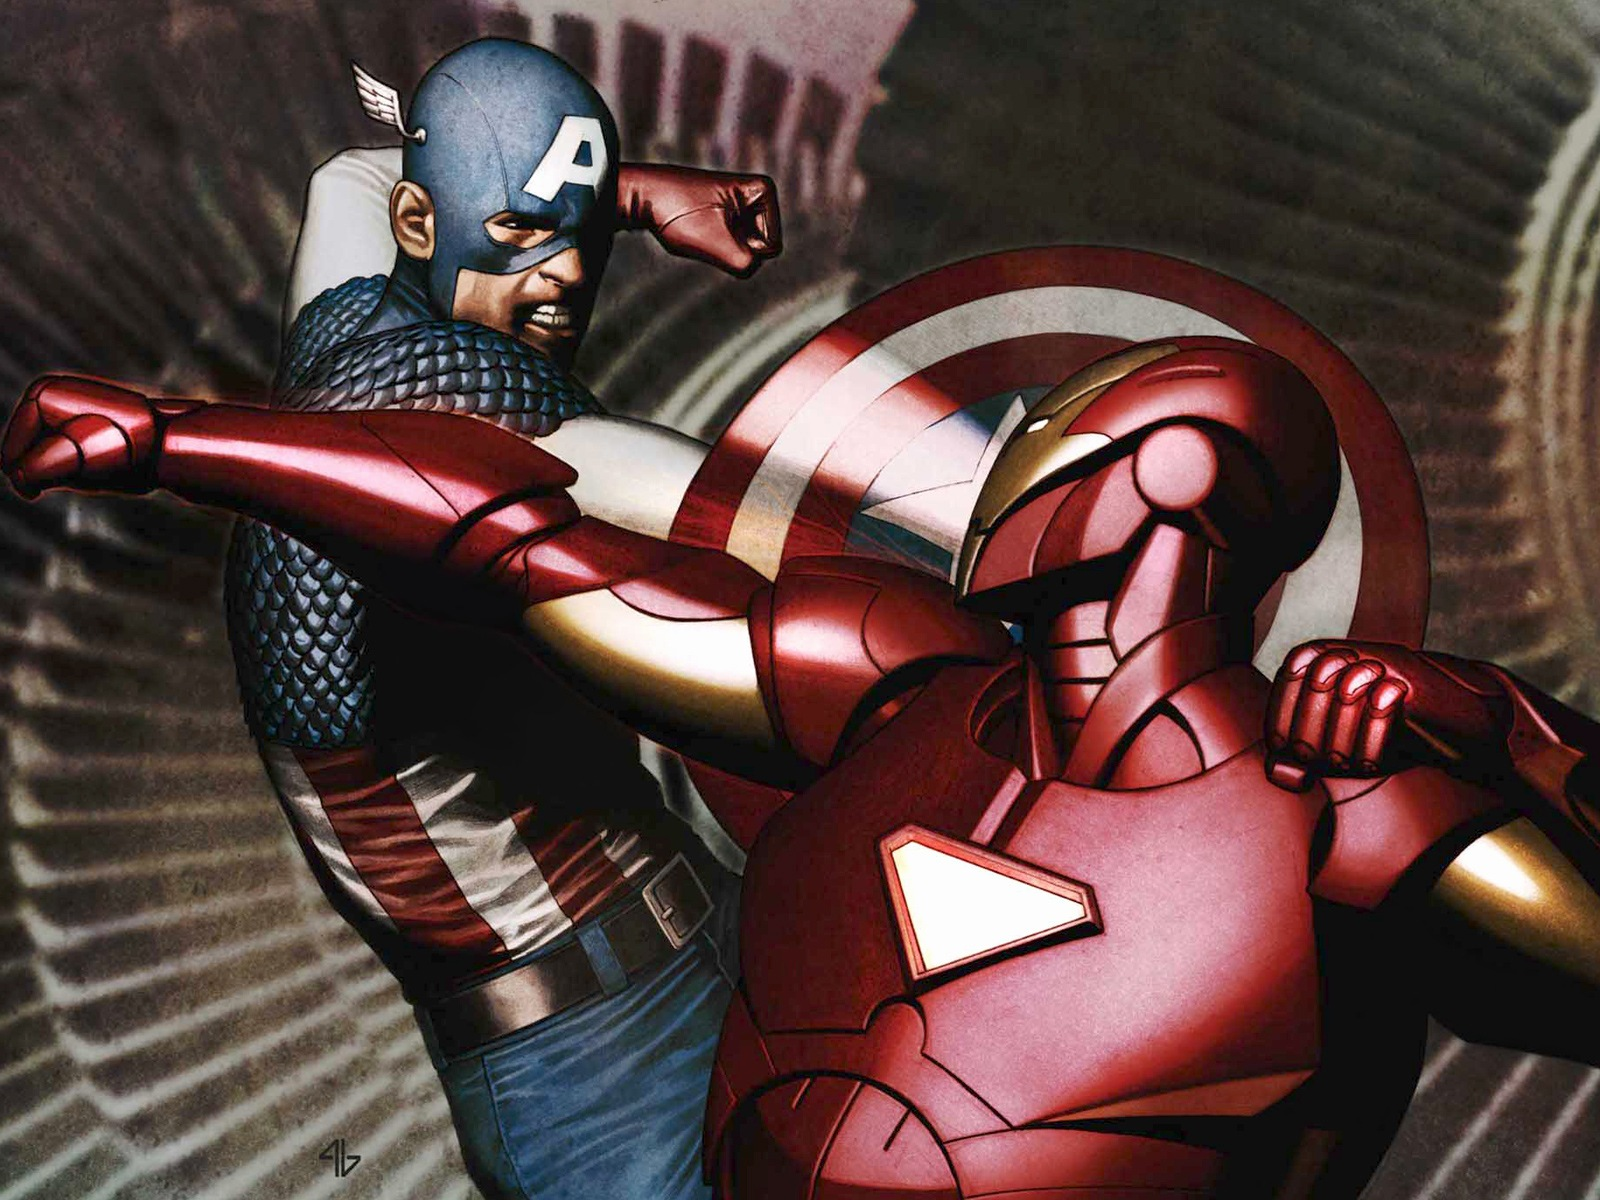 Free Download Iron Man And Captain America Desktop Wallpaper